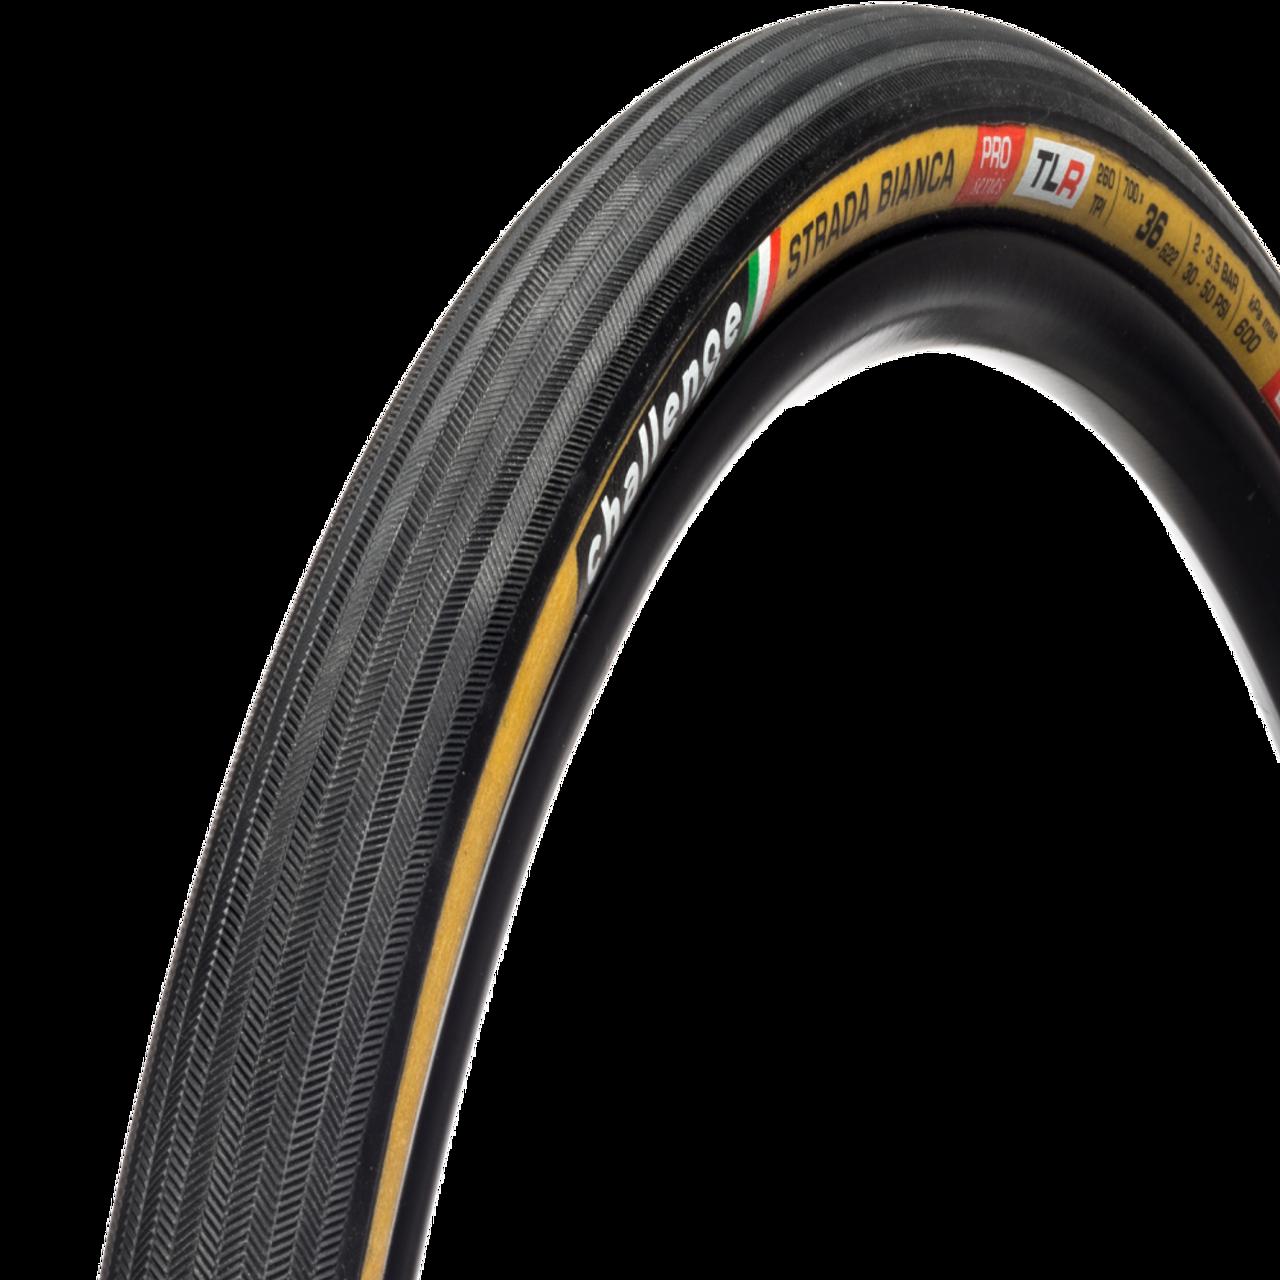 Challenge Strada Bianca Pro Tubeless Ready Cyclocross/Gravel Tyre- Tan 700 x 36